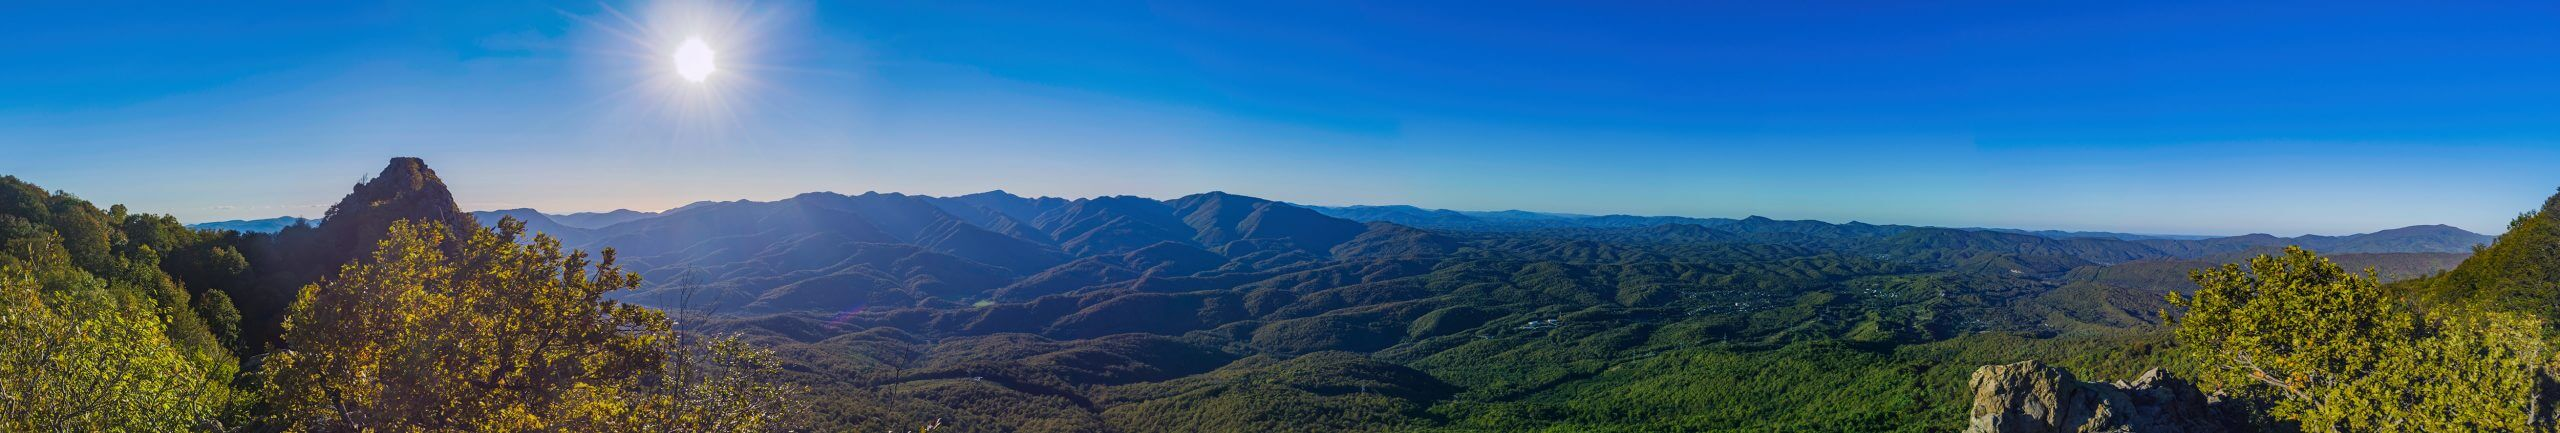 Панорама со скалы Индюшонок